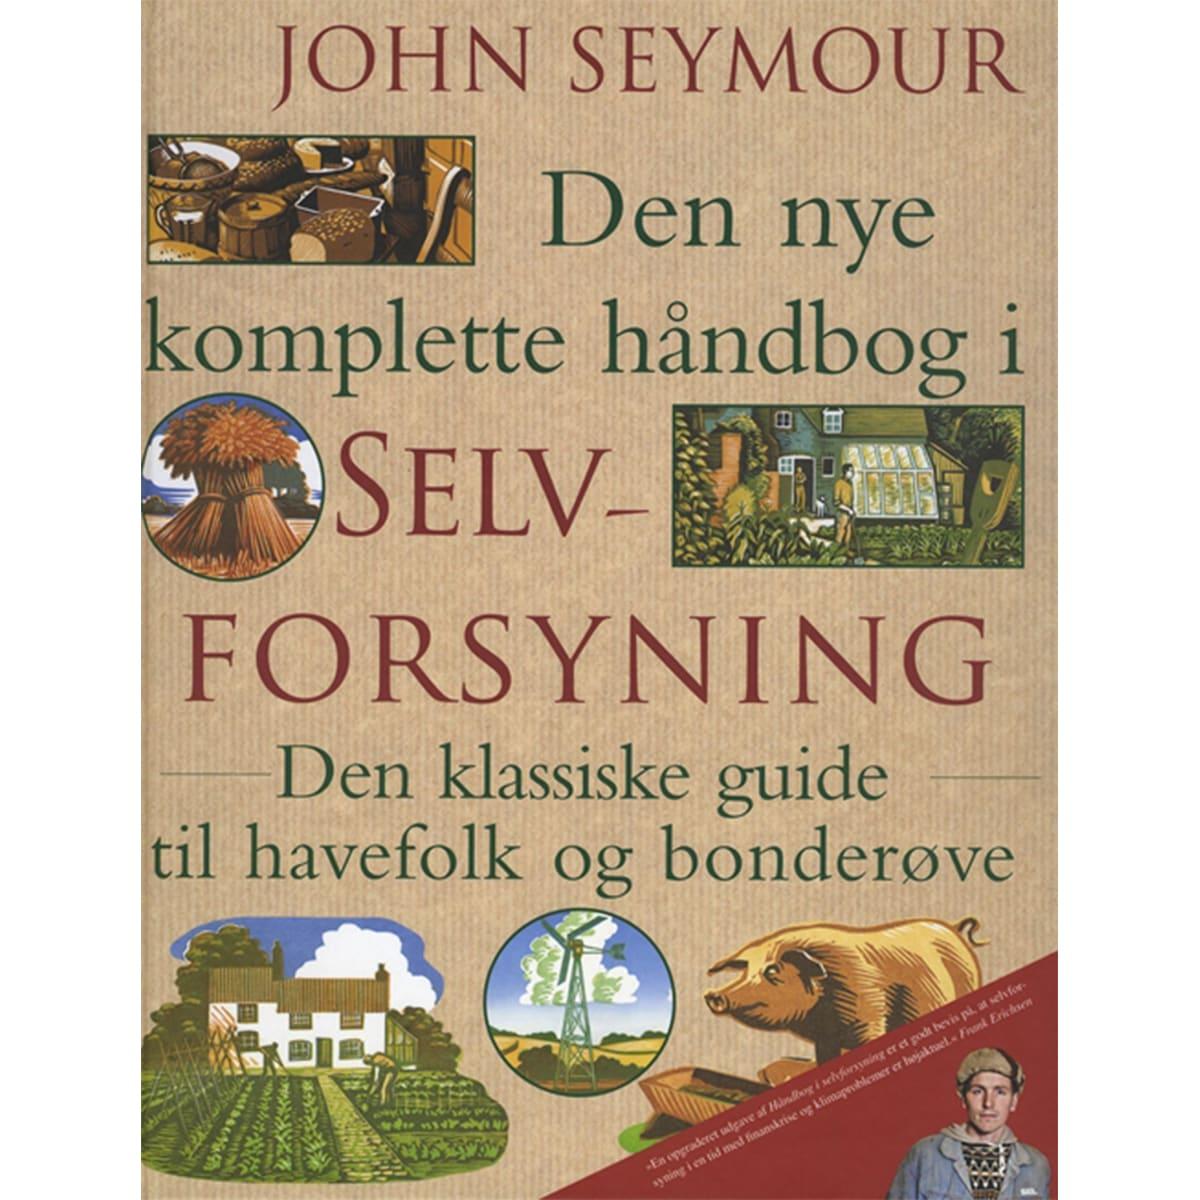 Af John Seymour